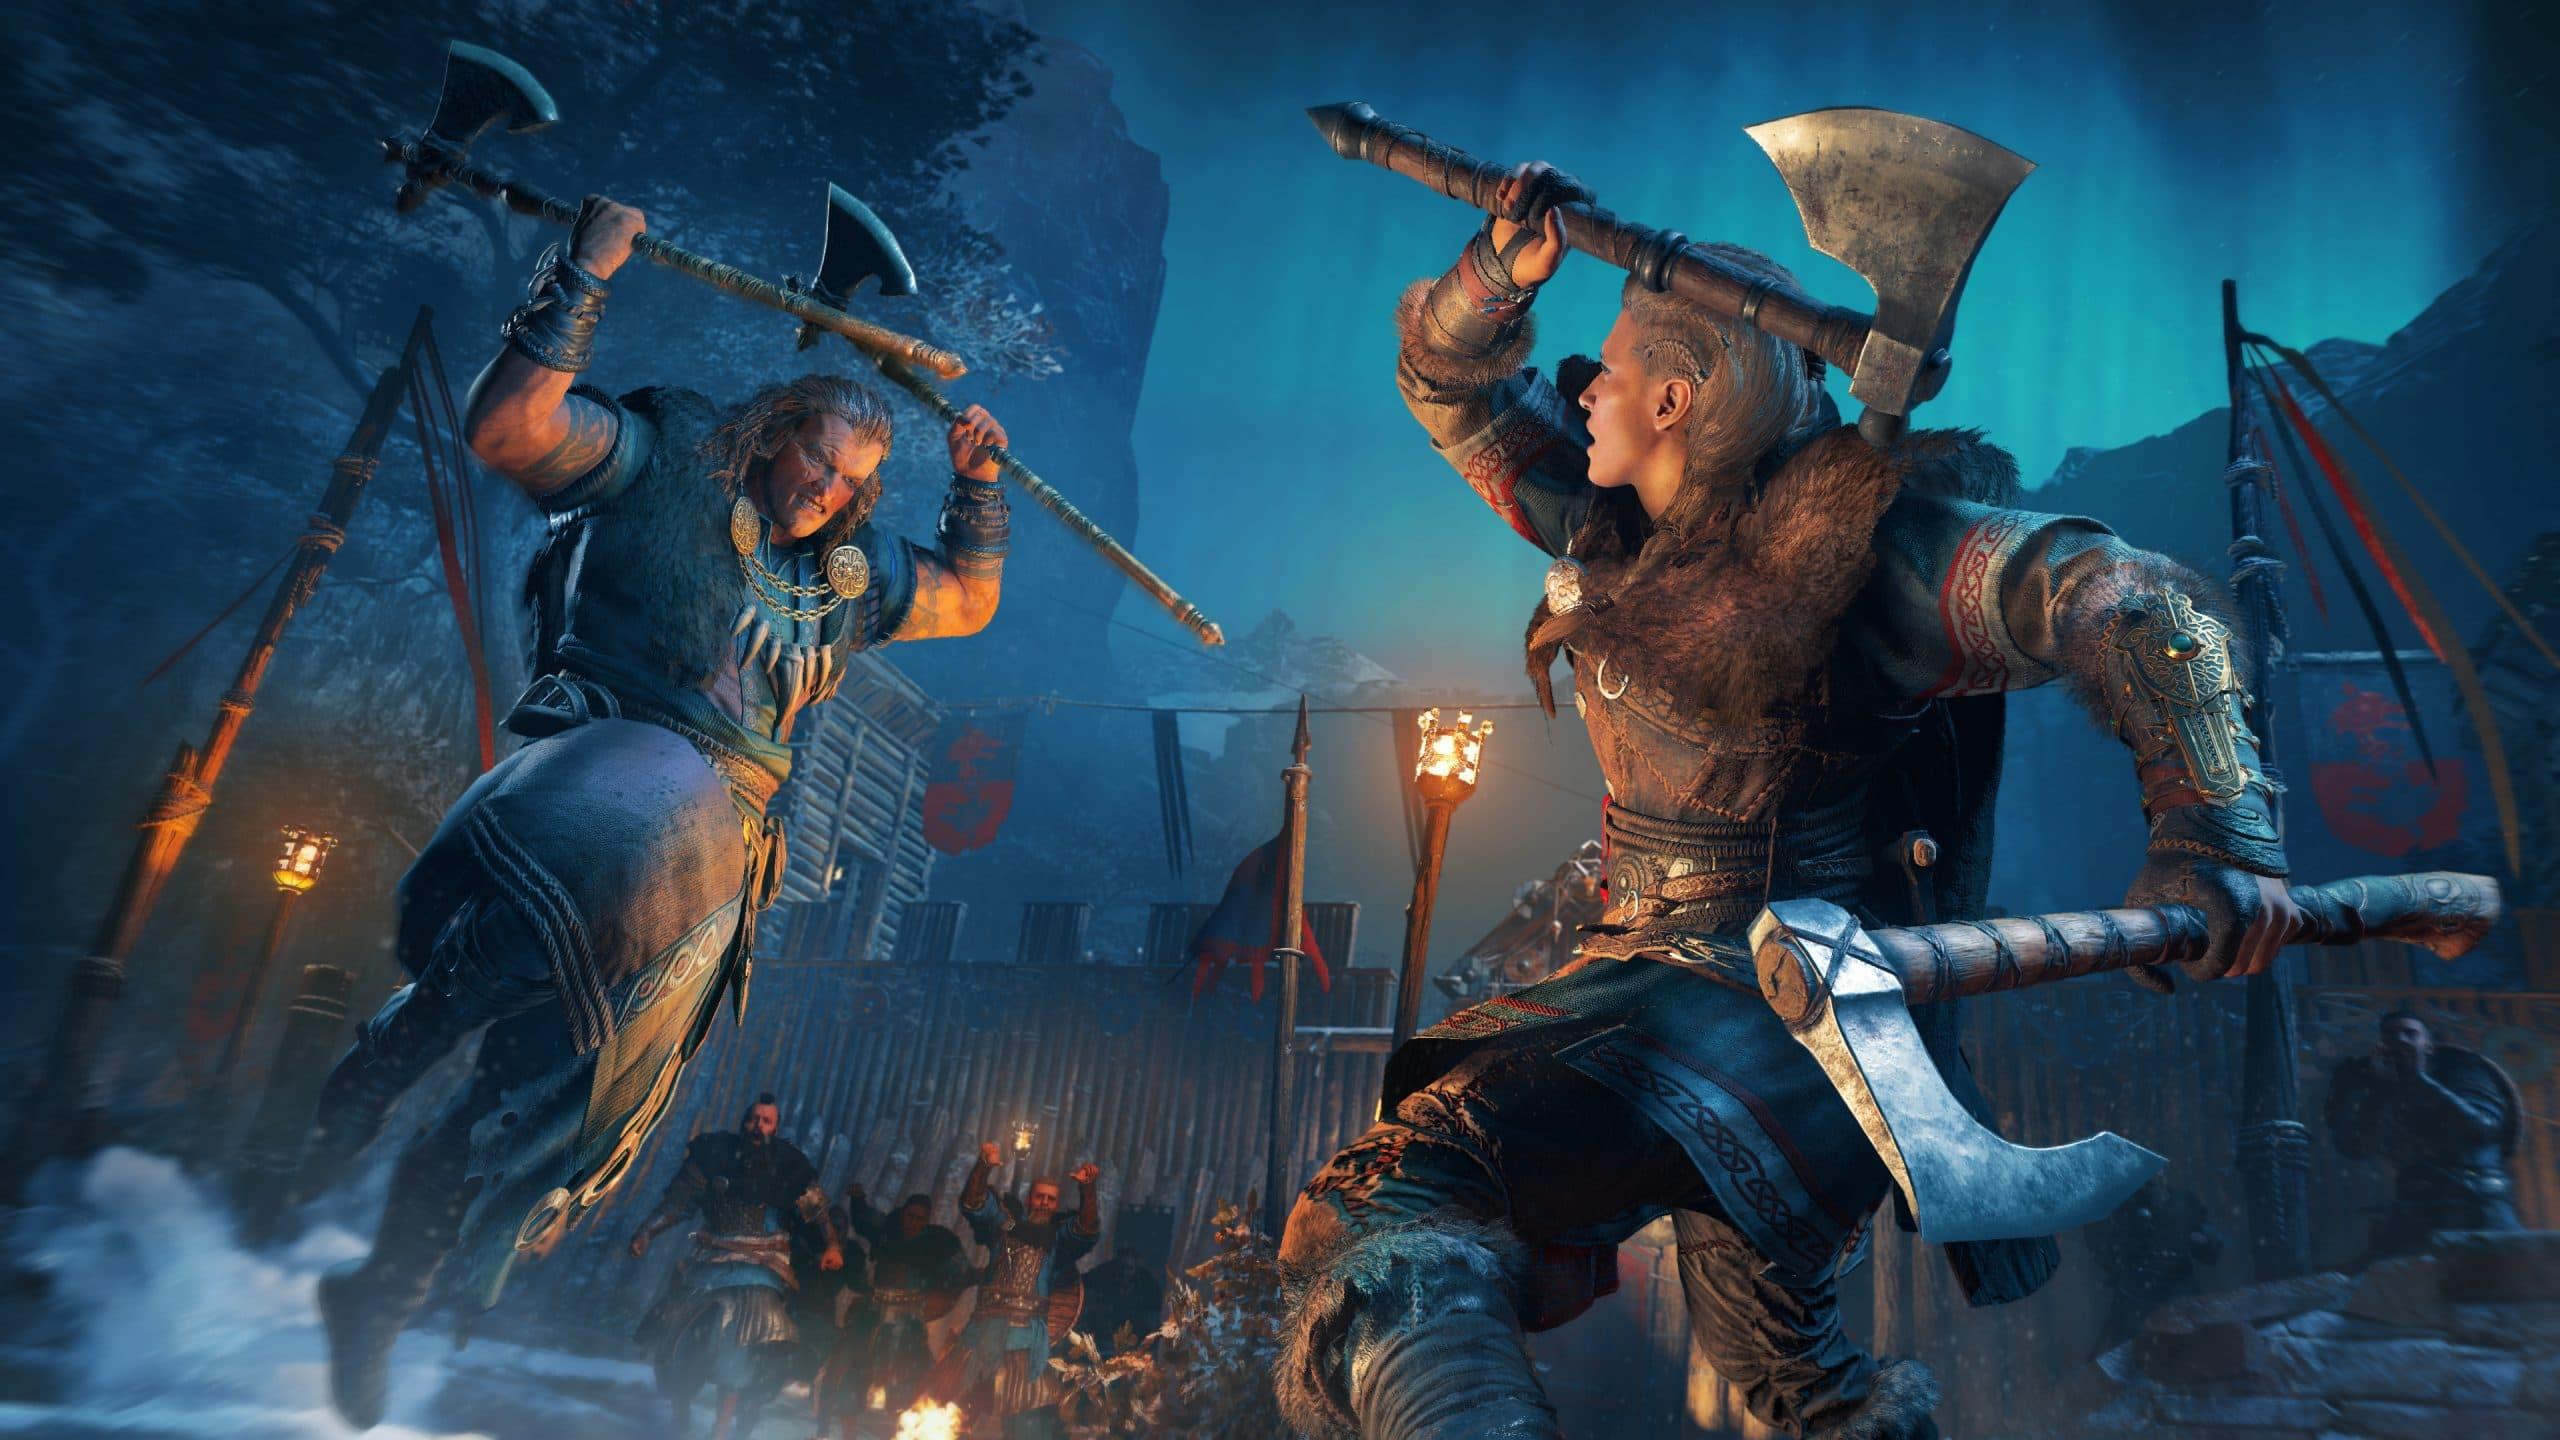 Assasin's Creed Valhalla Screenshot